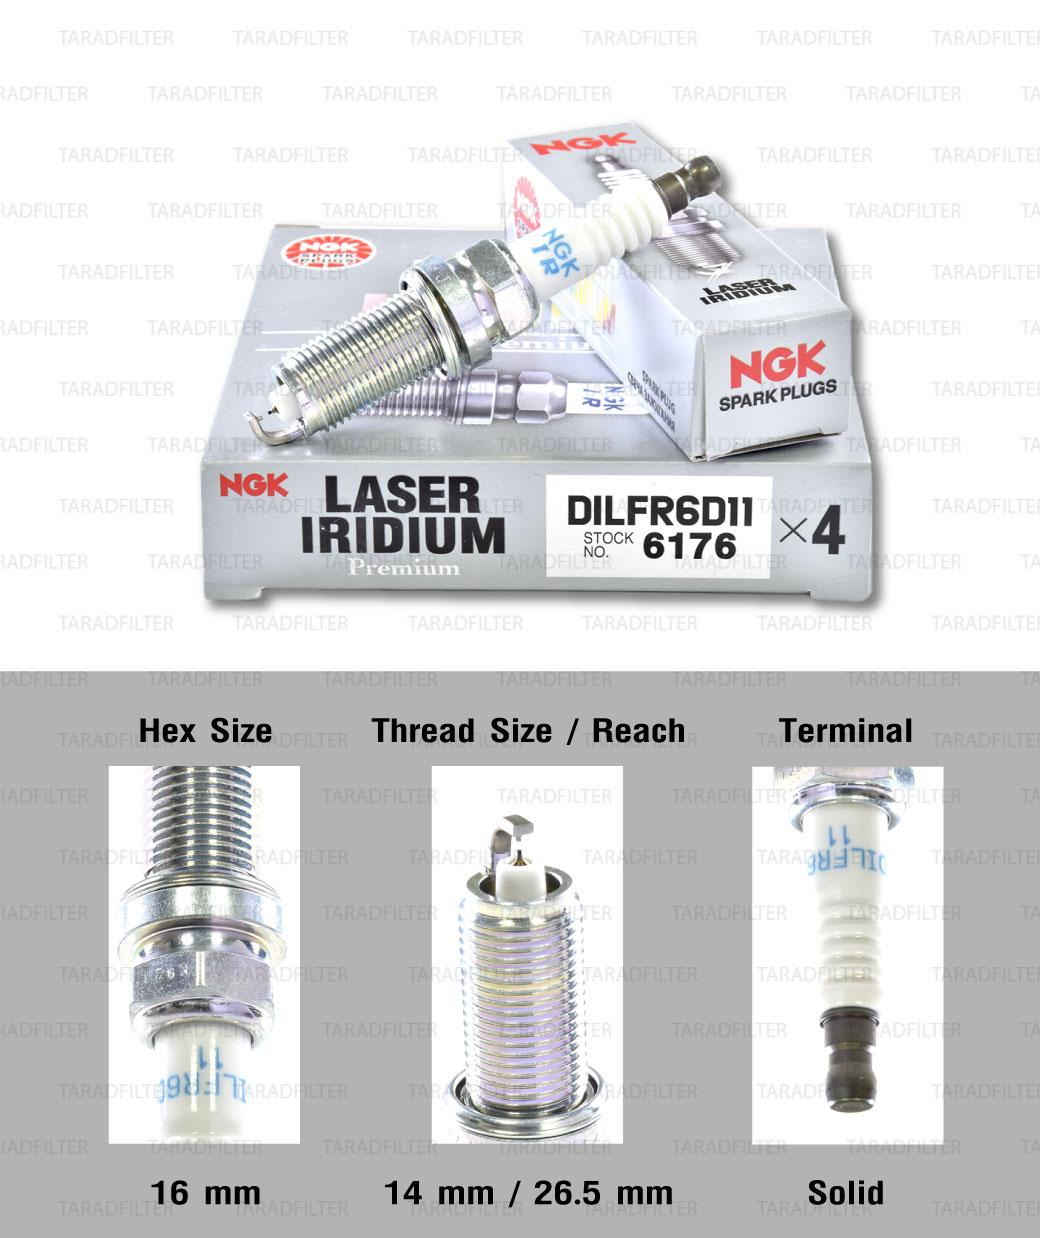 NGK หัวเทียน Laser Iridium ขั้ว Iridium ติดรถ DILFR6D11 ใช้สำหรับรถยนต์ มอเตอร์ไซค์ Mitsubishi Mirage 2012 มิราจ และ Attrage 2013 (แทนเบอร์ศูนย์ไทย DILFR6A11) (1 หัว) - Made in Japan